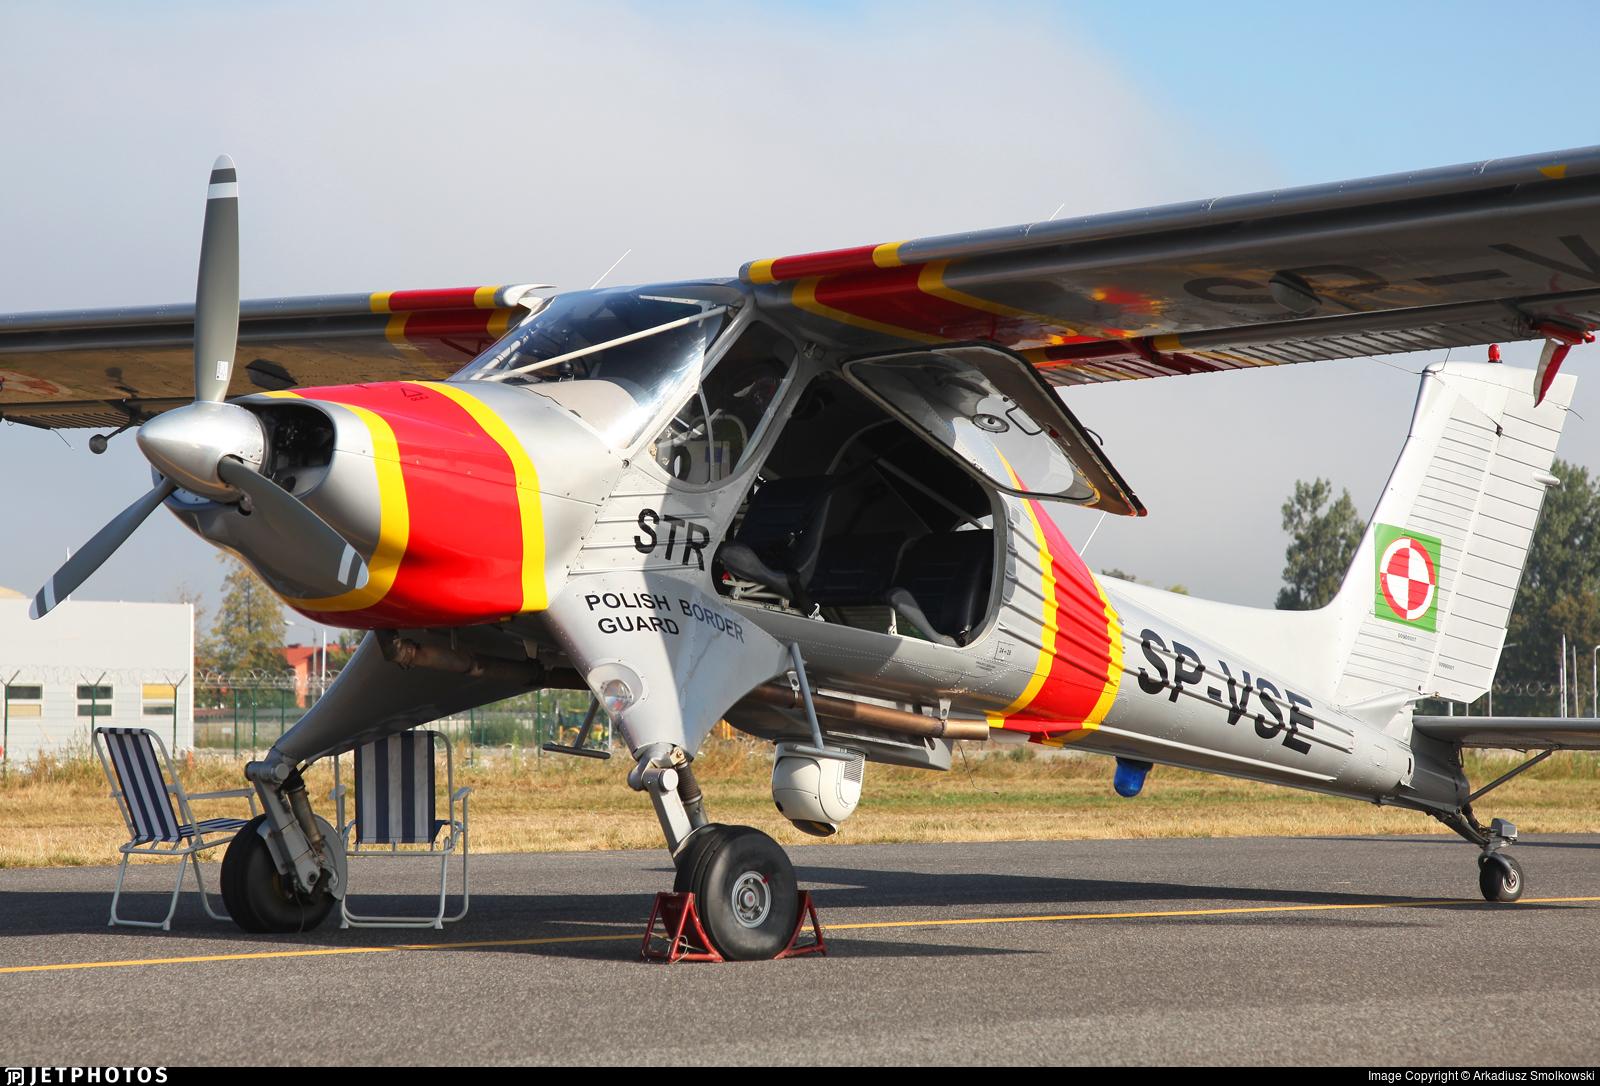 SP-VSE | PZL-Okecie 104M Wilga 2000 | Poland - Border Guard